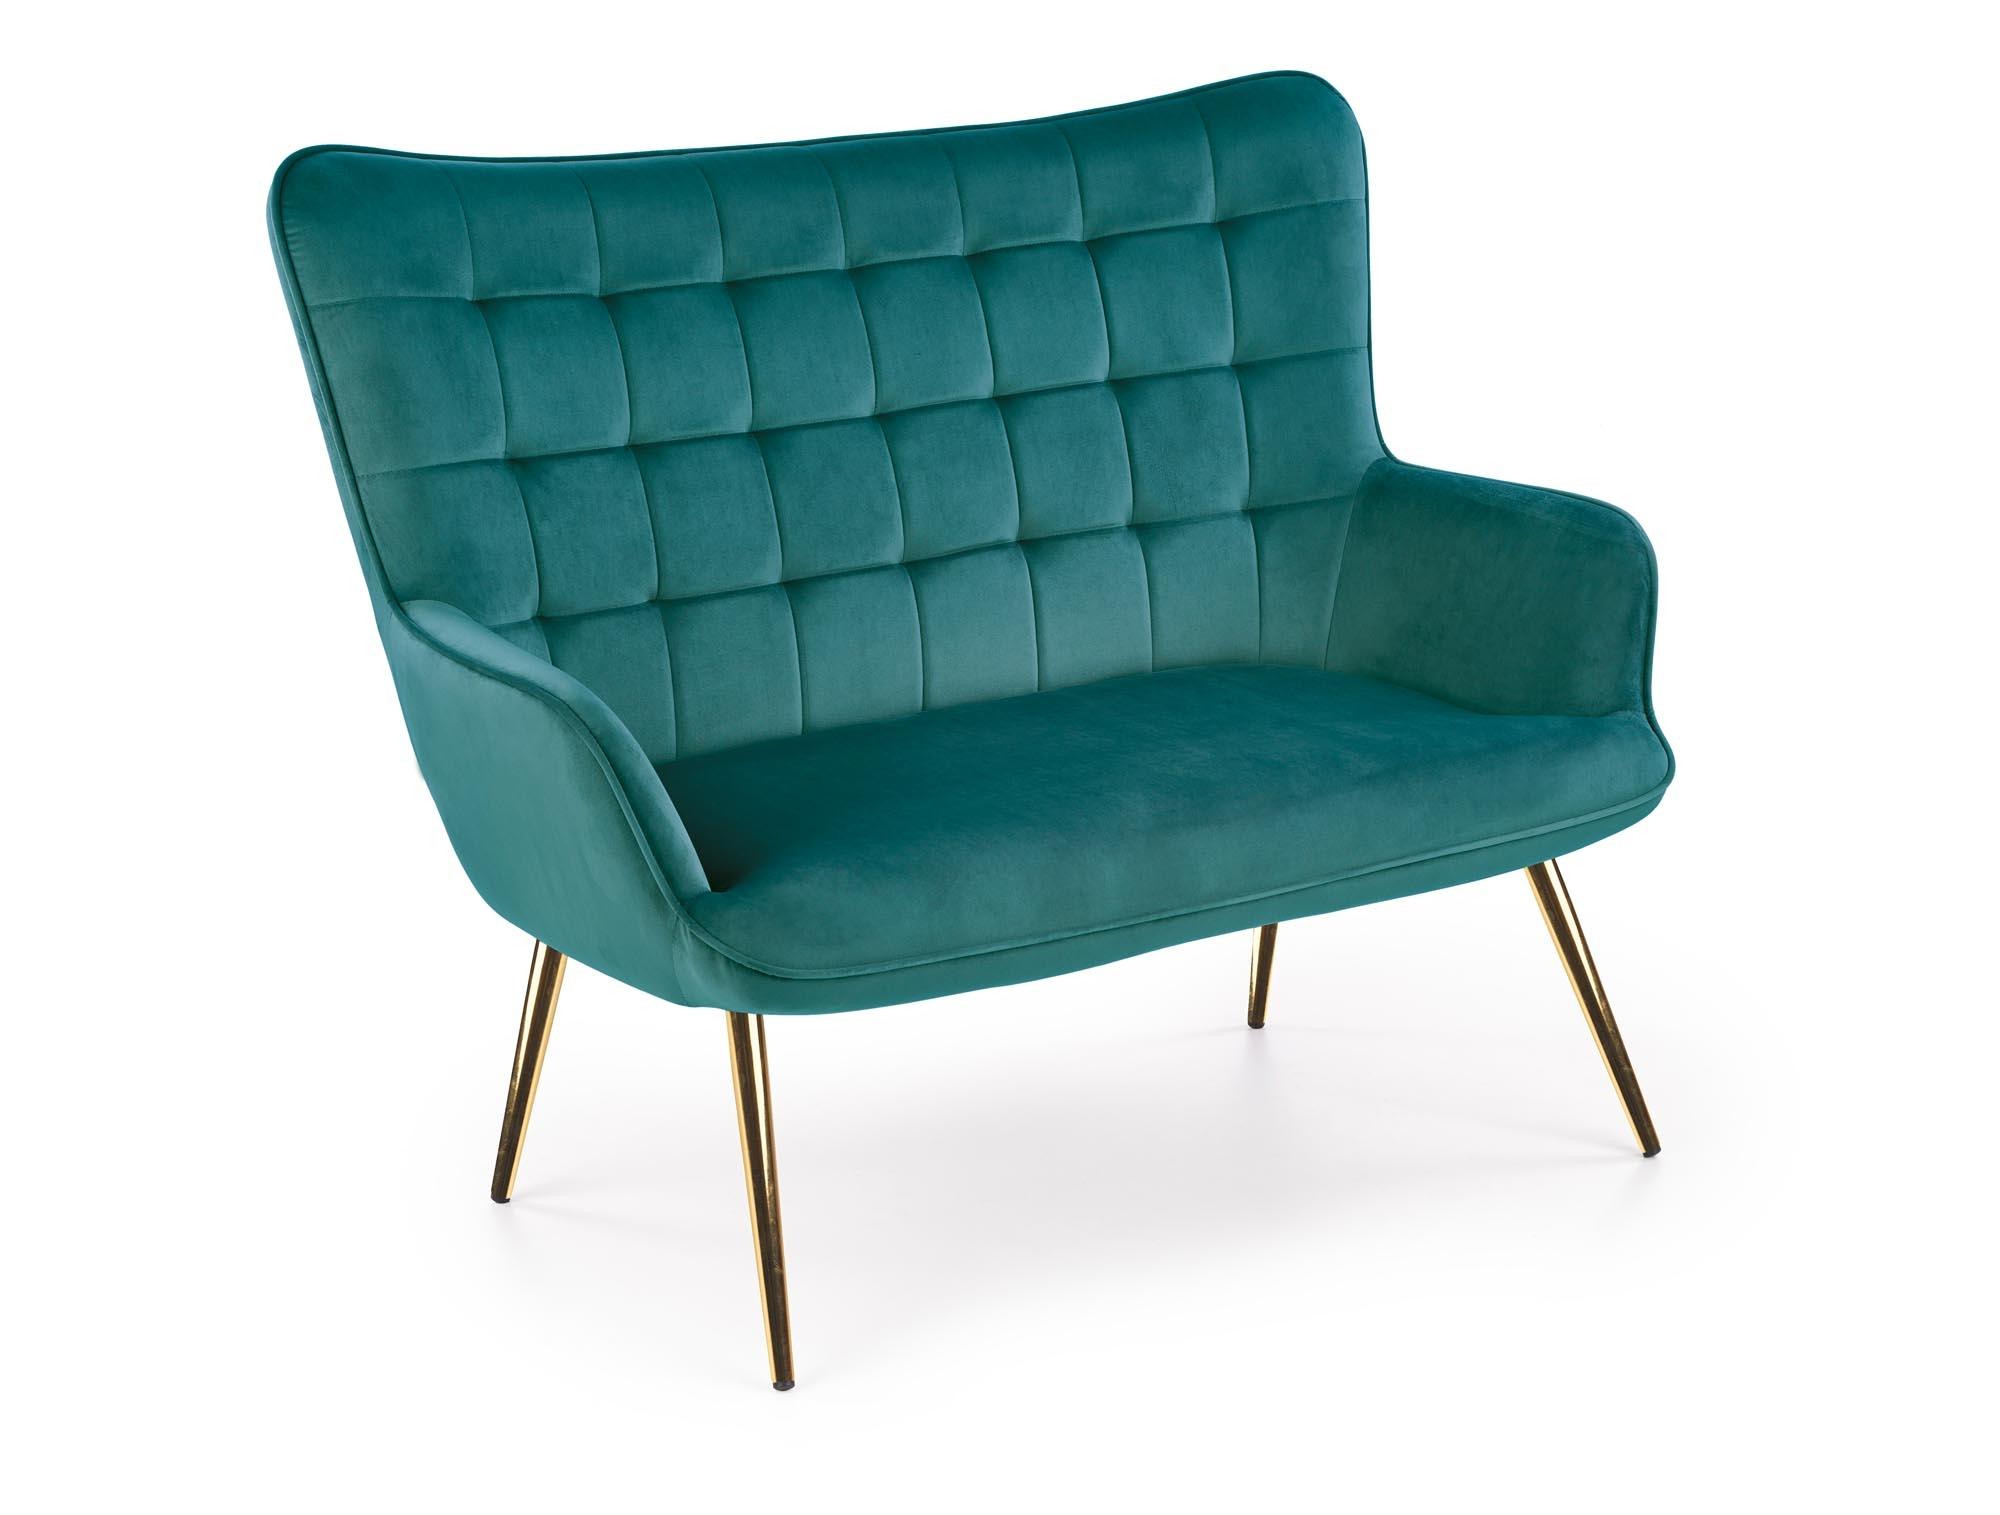 Canapea fixa tapitata cu stofa, 2 locuri Castel 2XL Verde inchis / Auriu, l129xA99xH100 cm